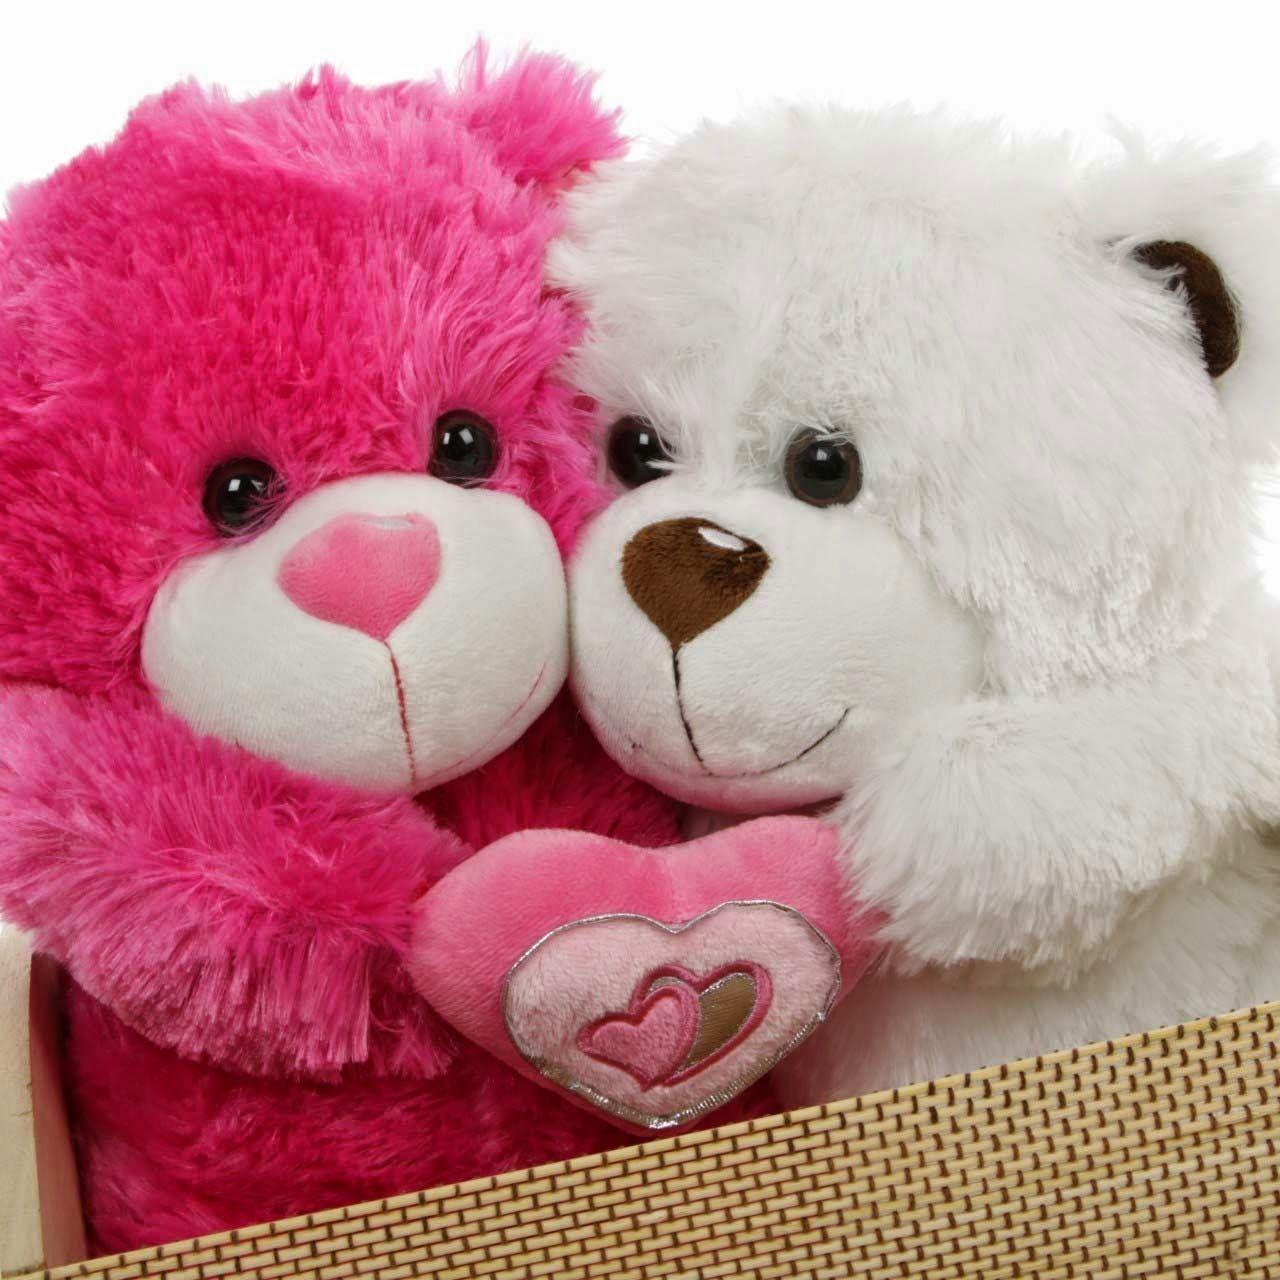 Download Wallpaper Of Love Teddy Bears Hd Wallpaper Of Love